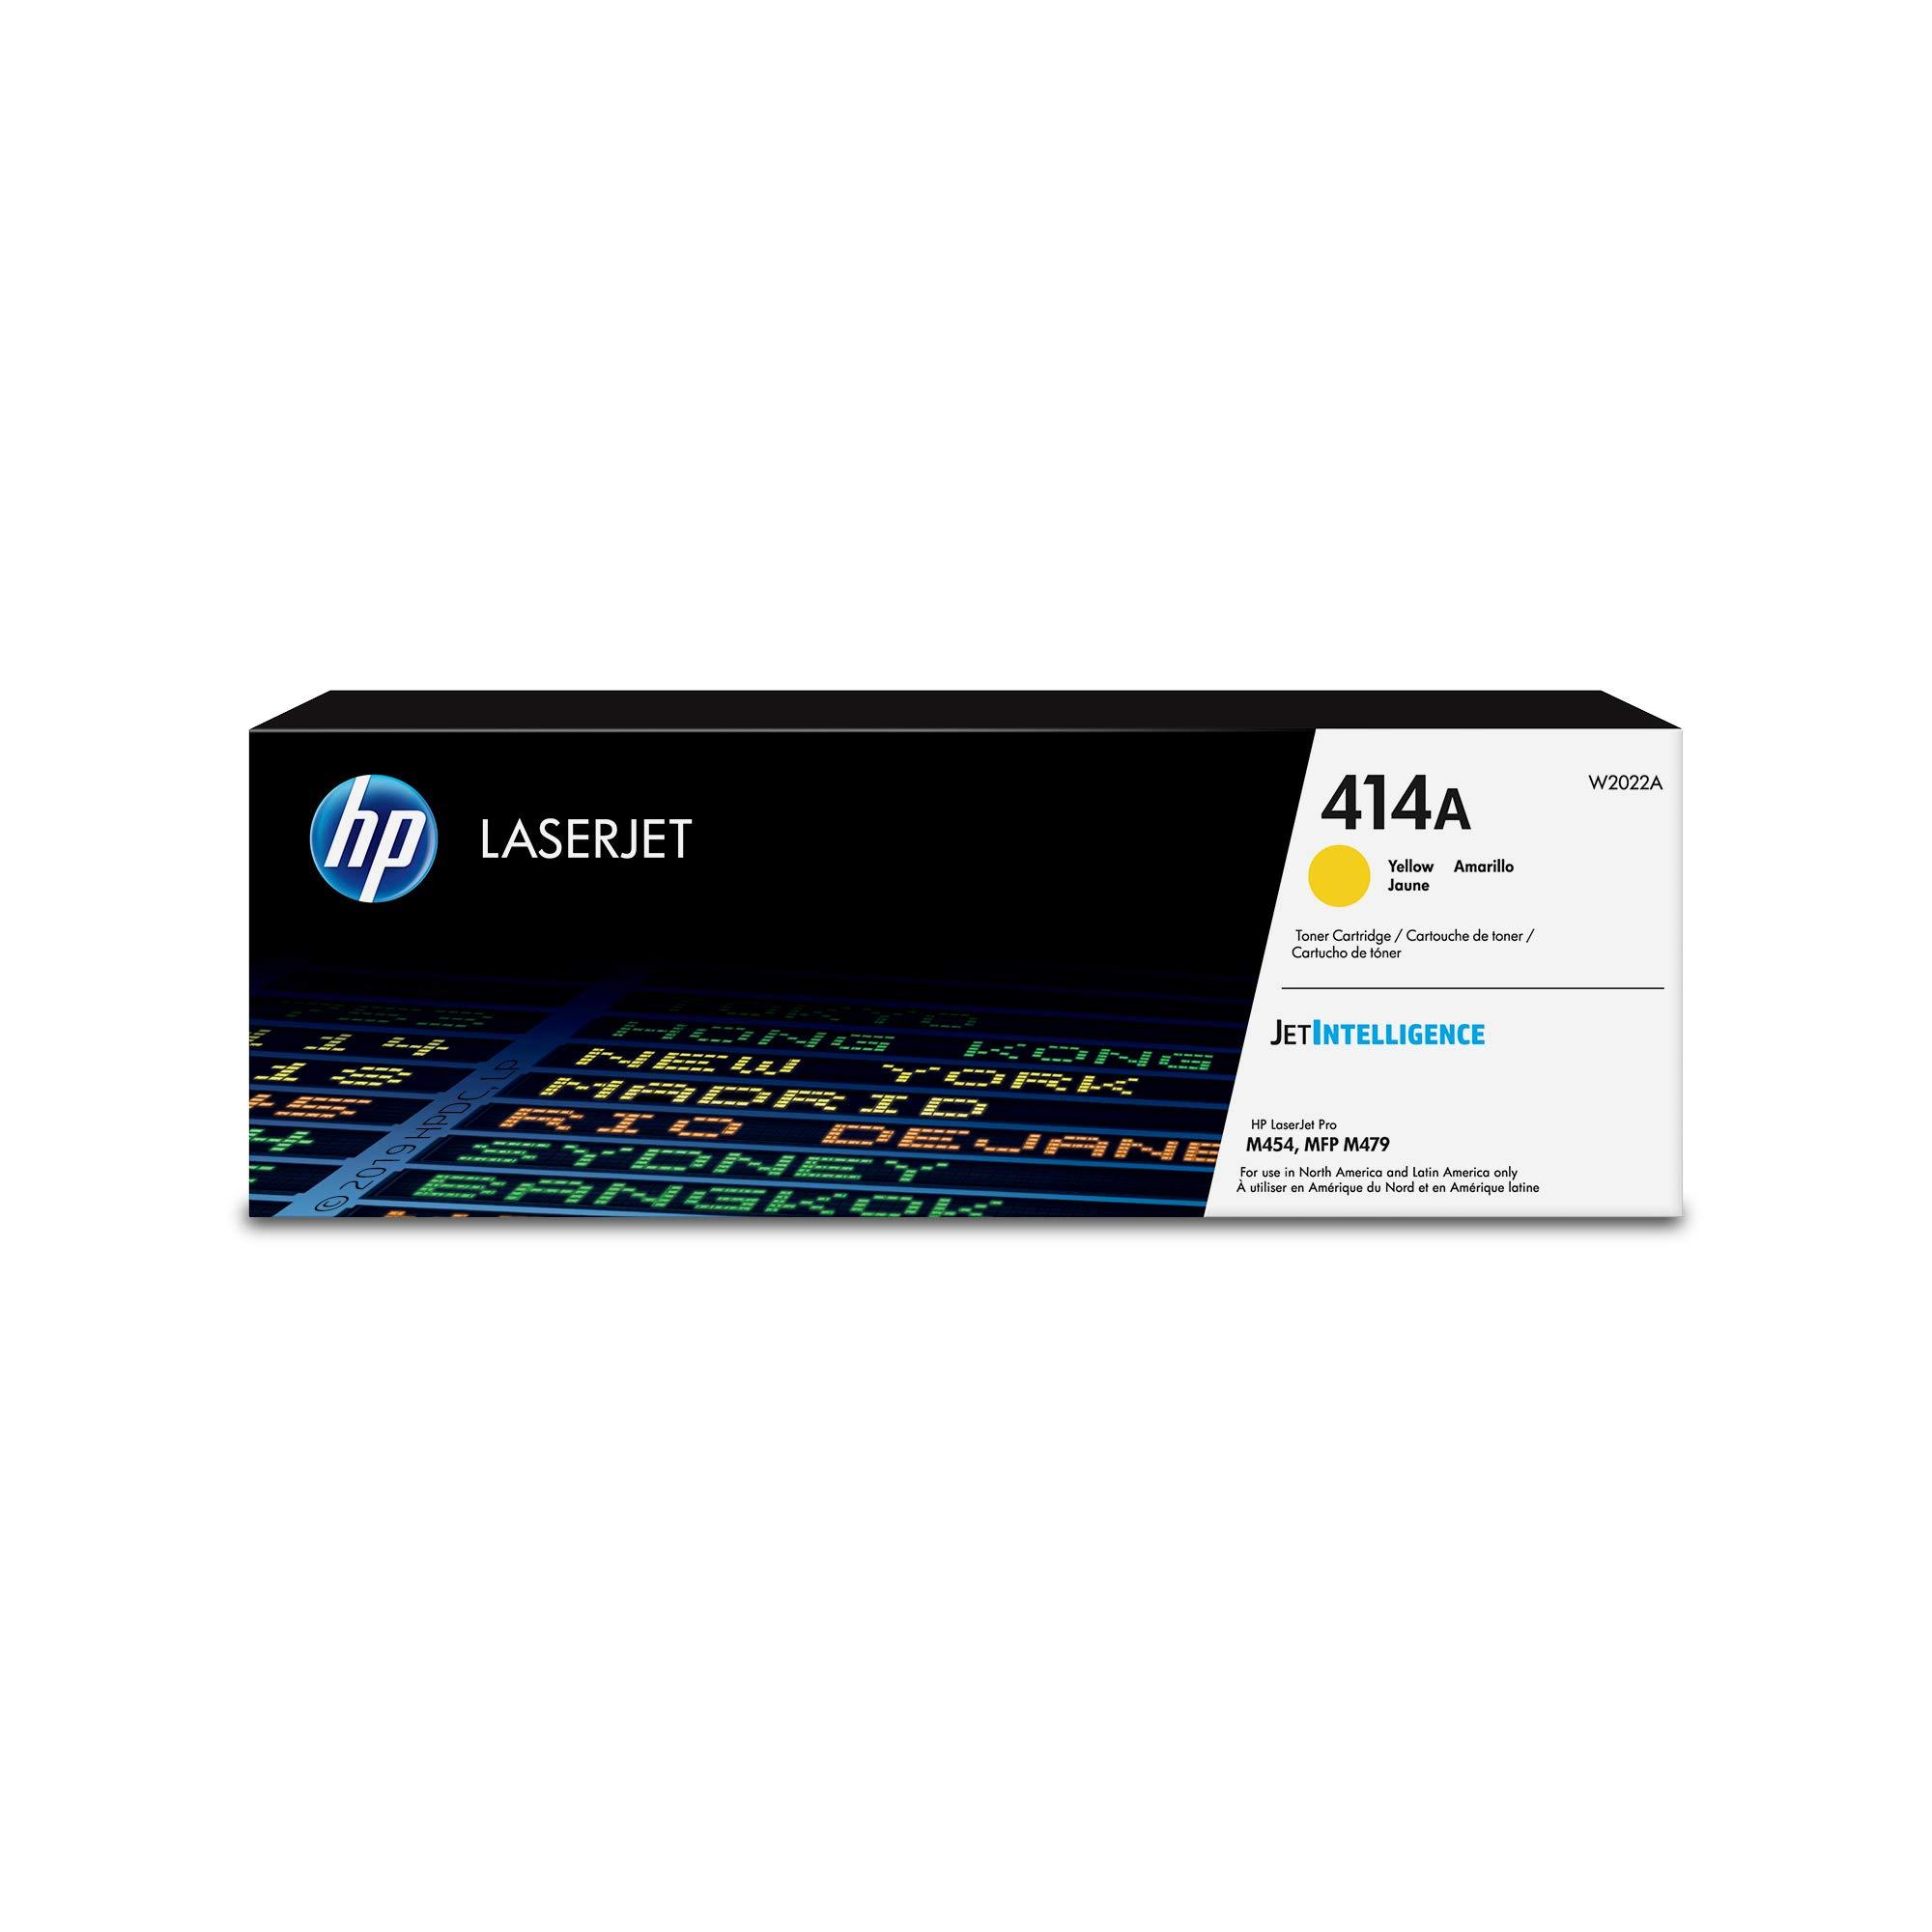 HP 414A | W2022A | Toner Cartridge | Yellow by HP